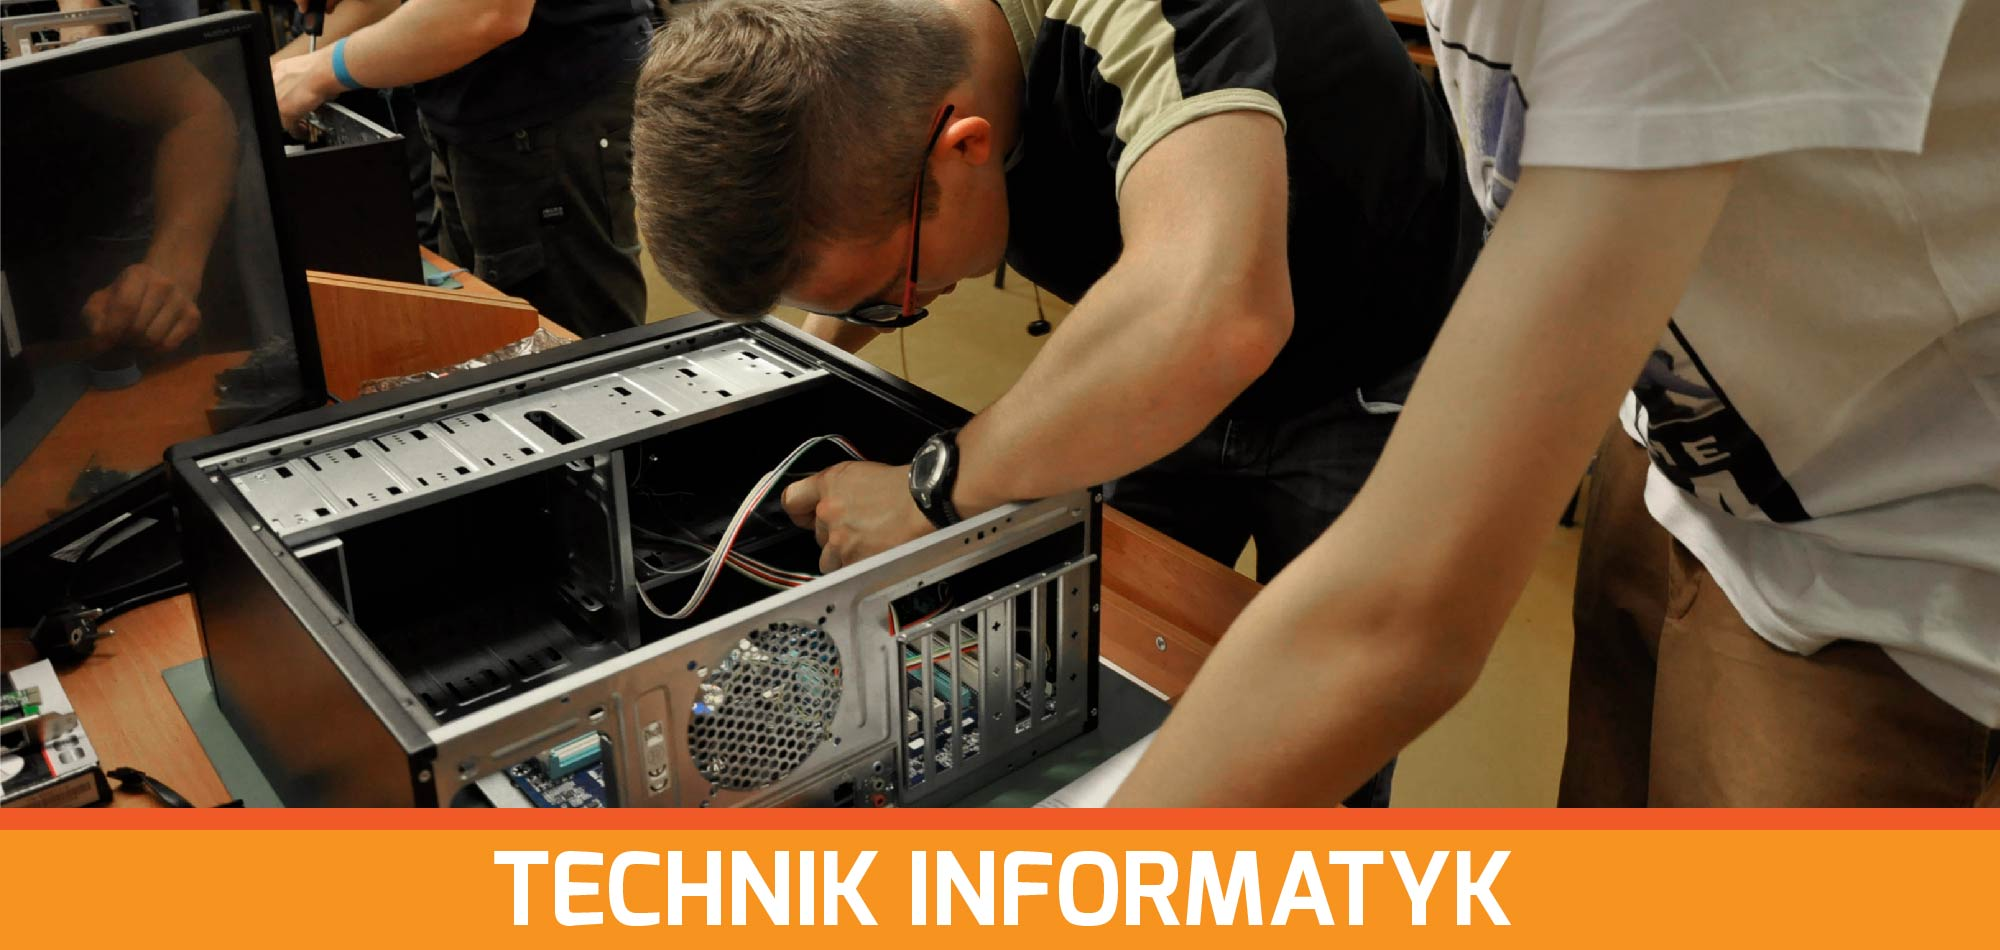 Technik informatyk | Technikum Nr1 wZamościu